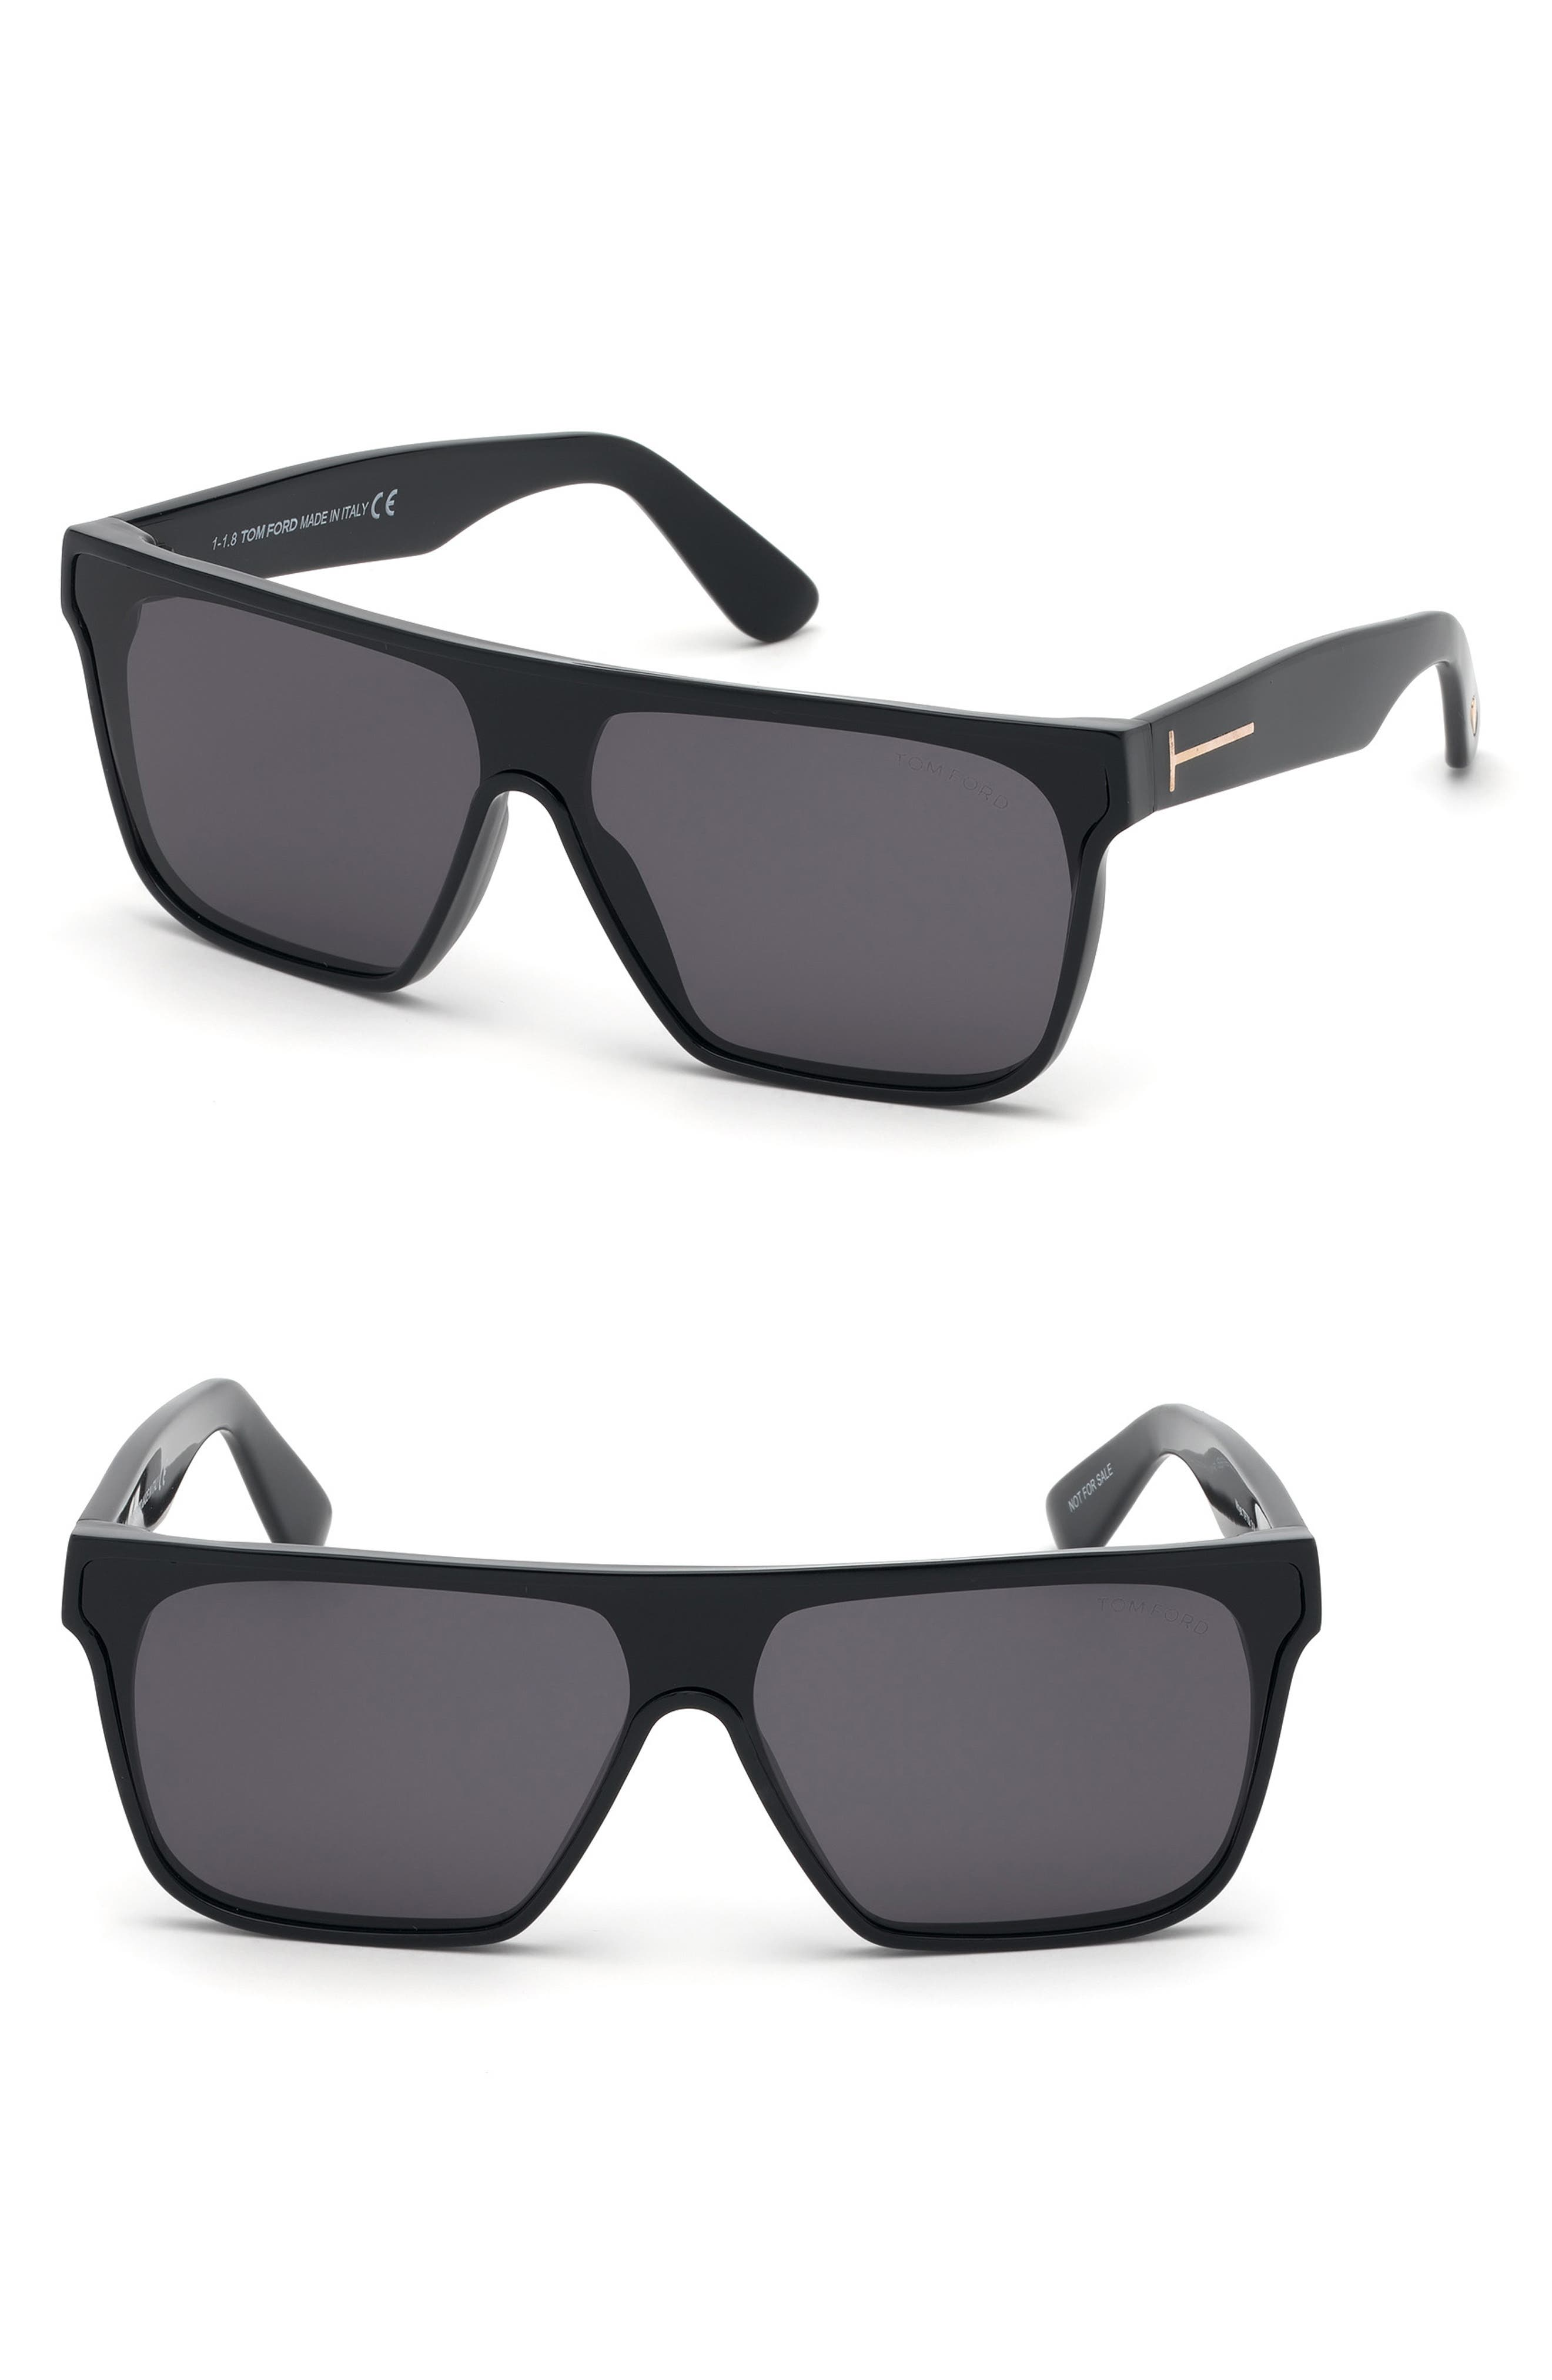 41a782c3d4b86 Men s Tom Ford Sunglasses   Eyeglasses